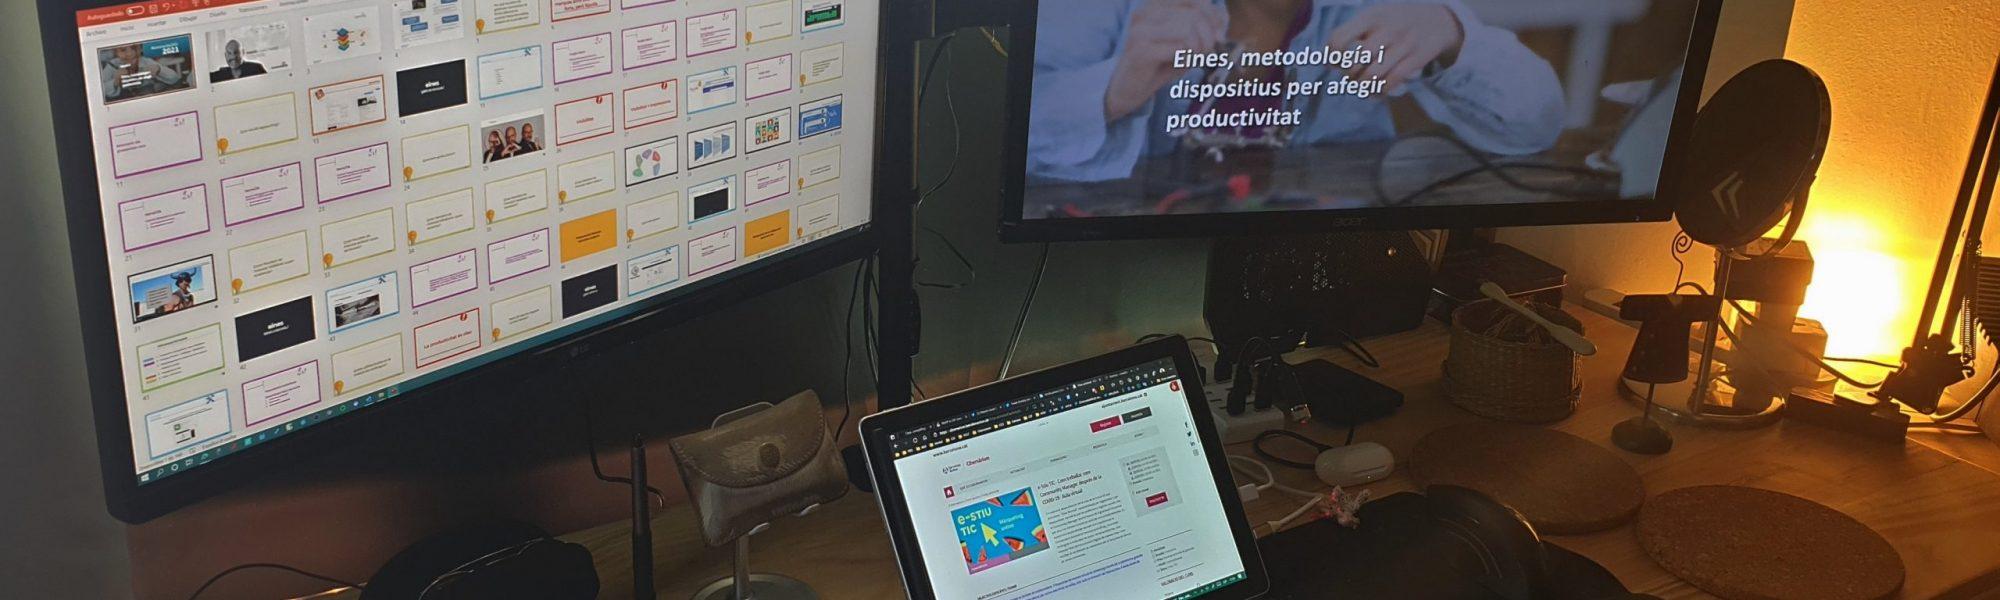 e-Stiu TIC – Cómo trabajar como Community Manager después de la Covid-19 – Cibernarium @Barcelonactiva